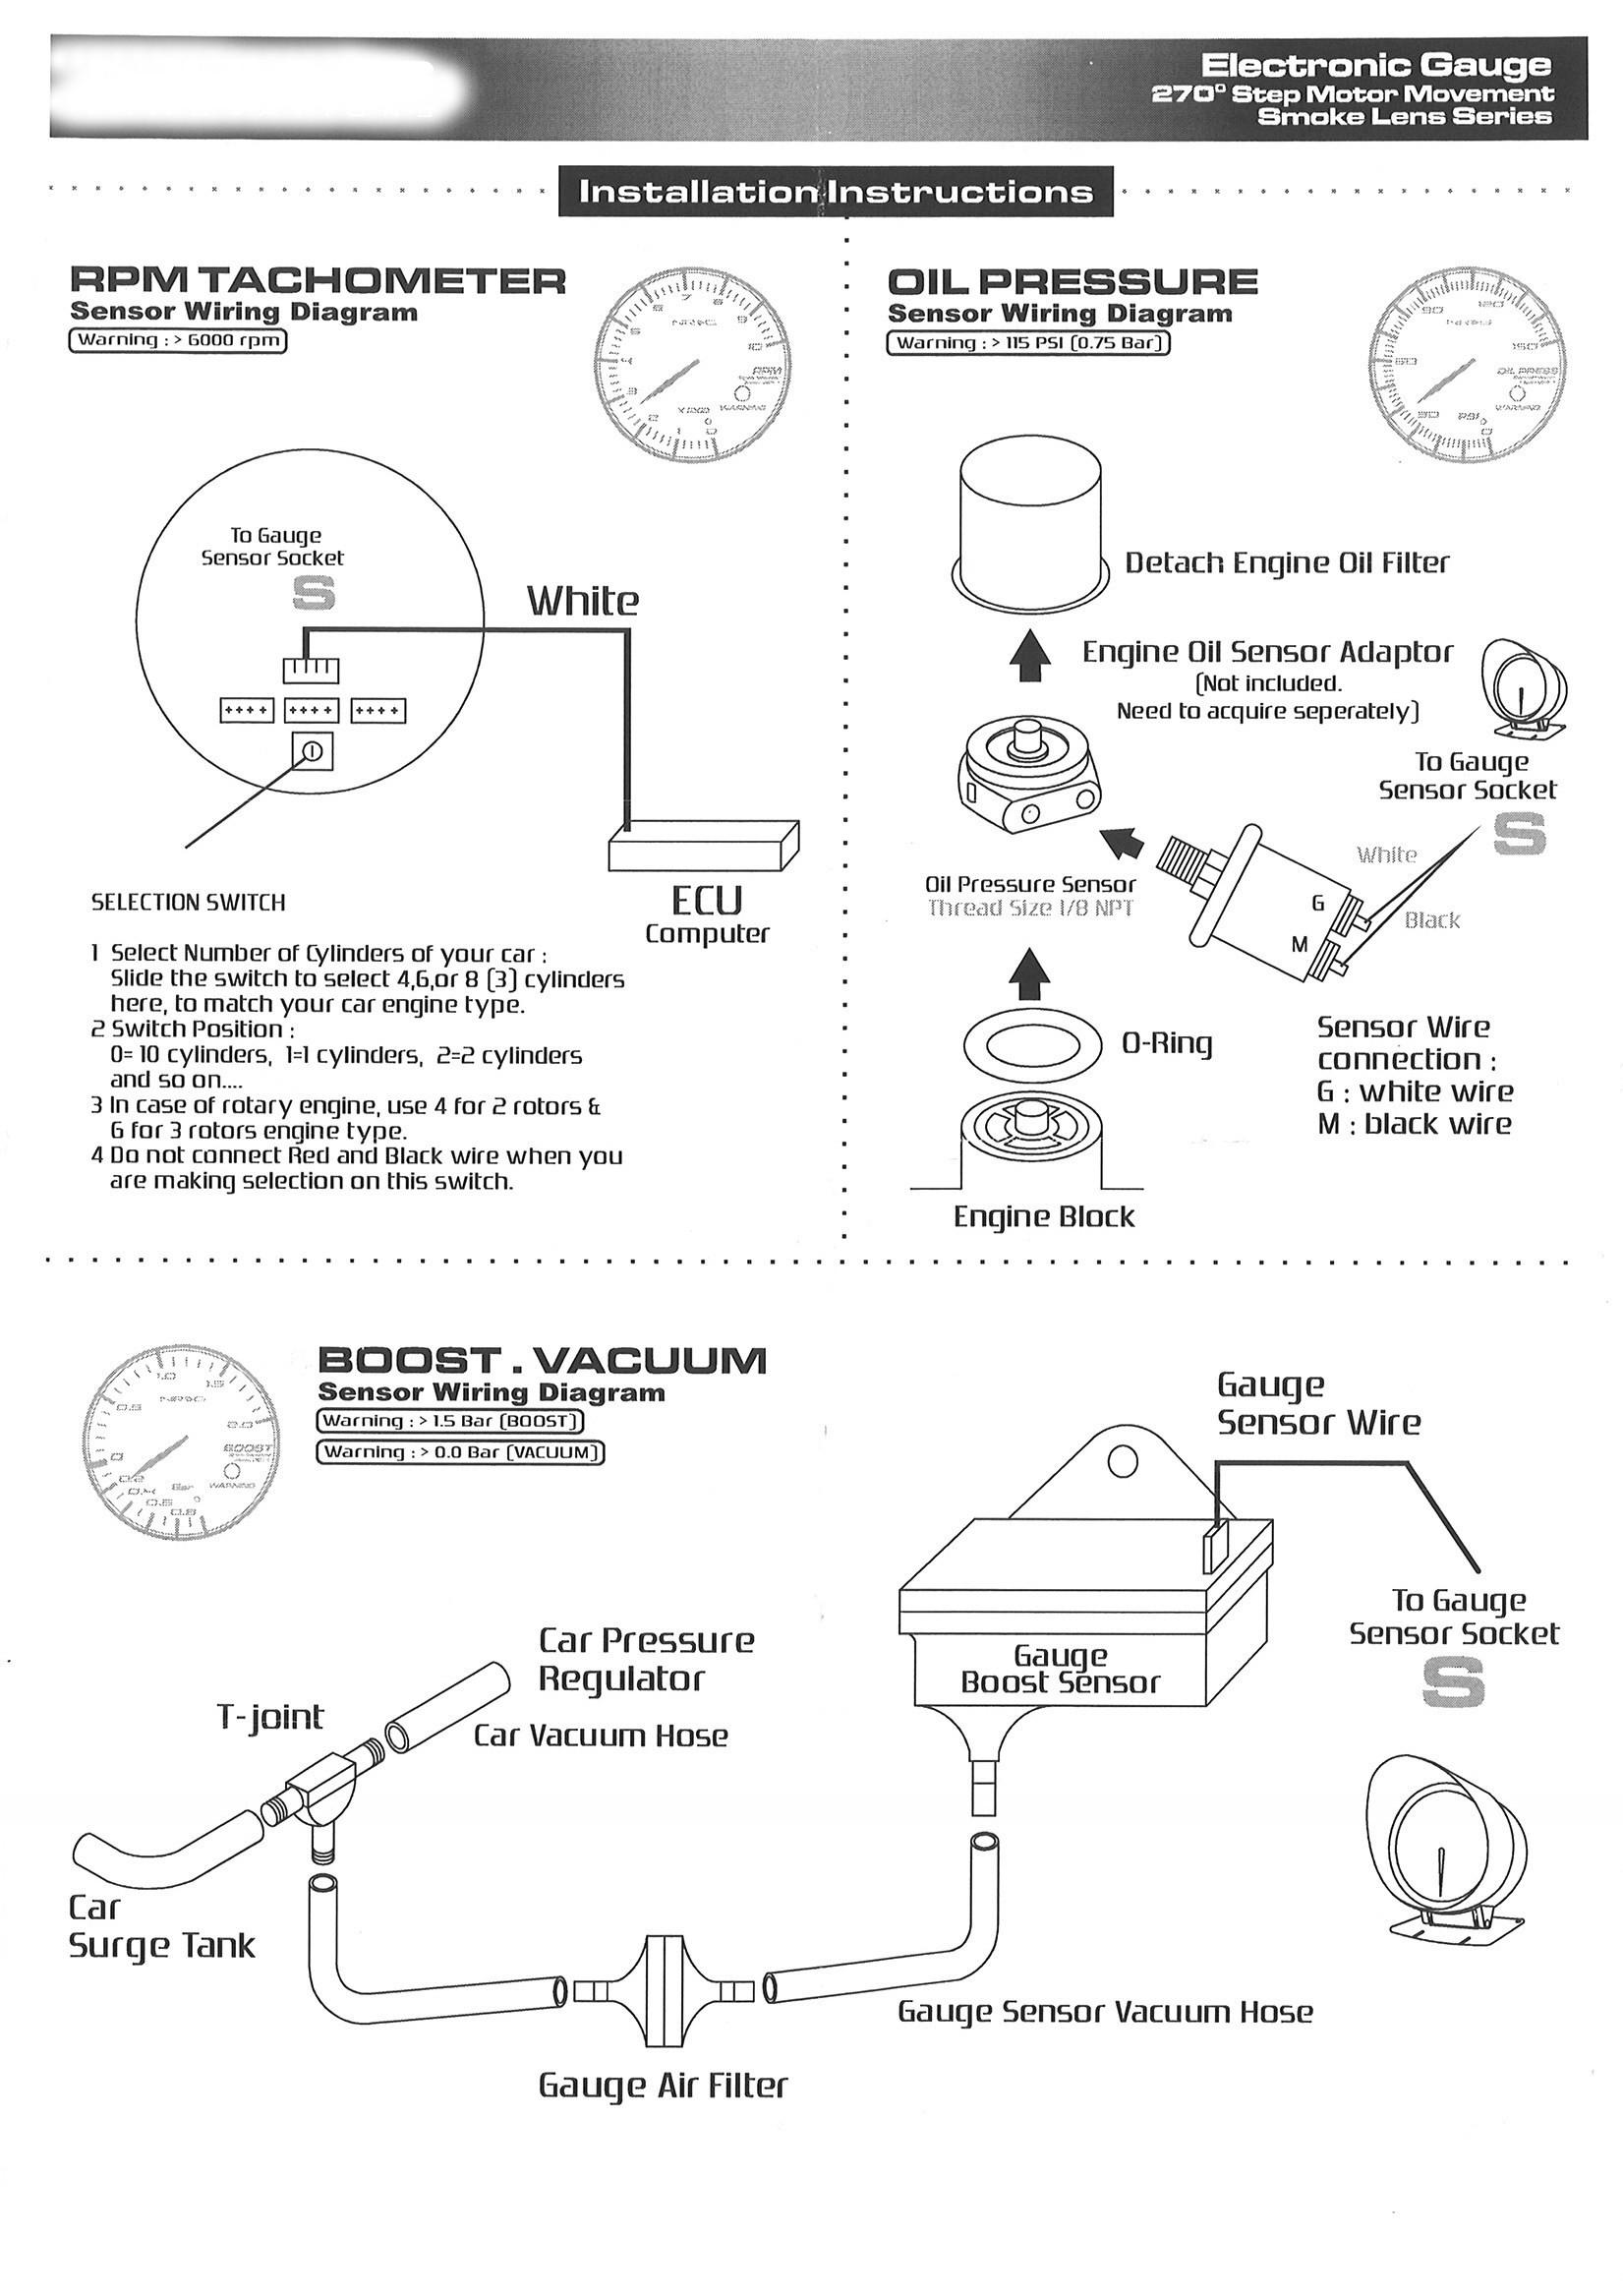 Wiring Diagrams For Aftermarket Gauges   Diy